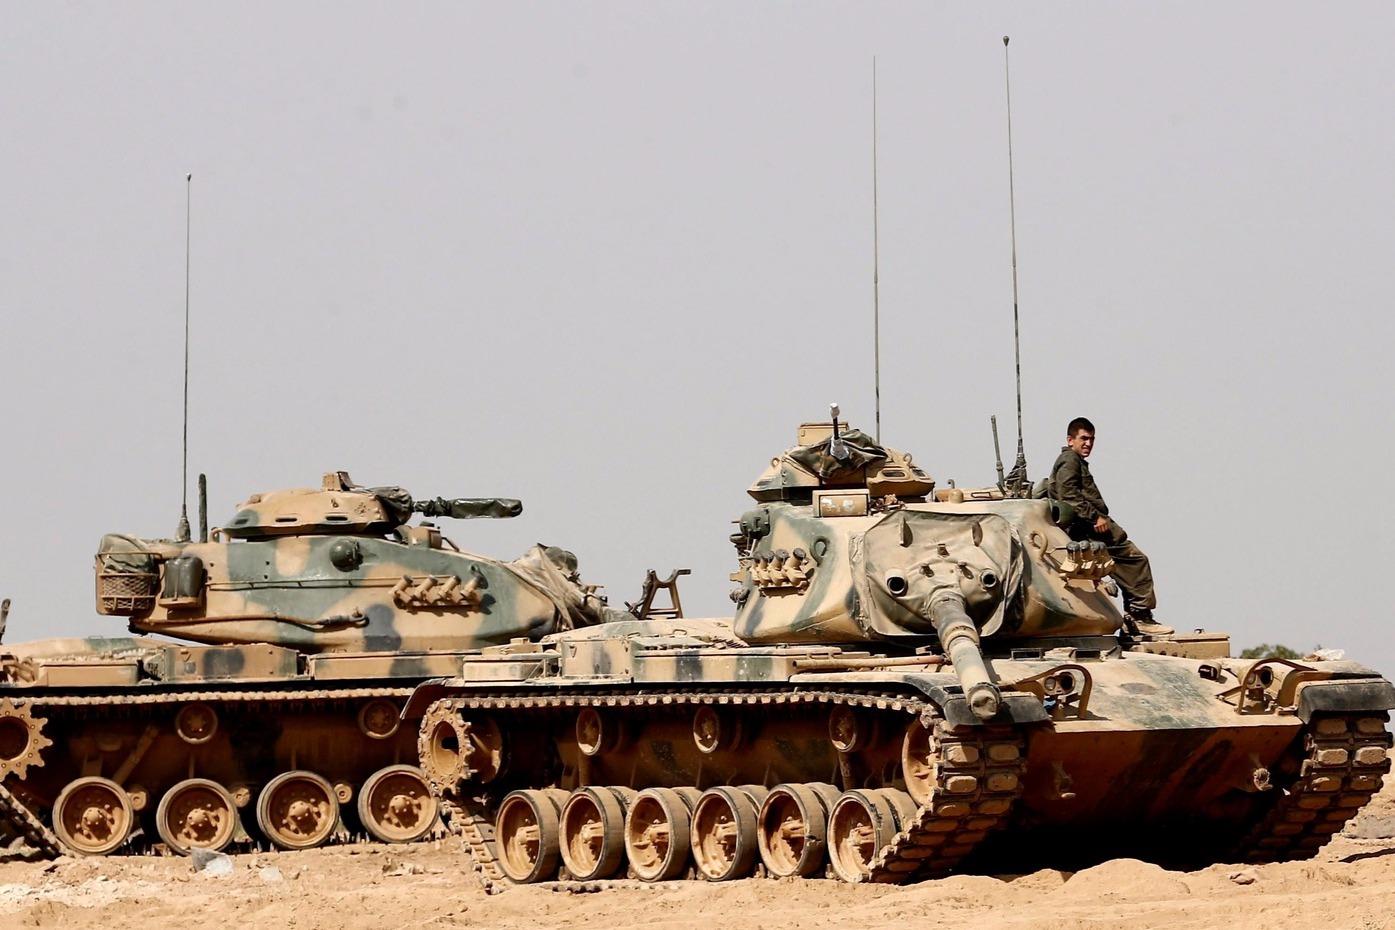 török tank